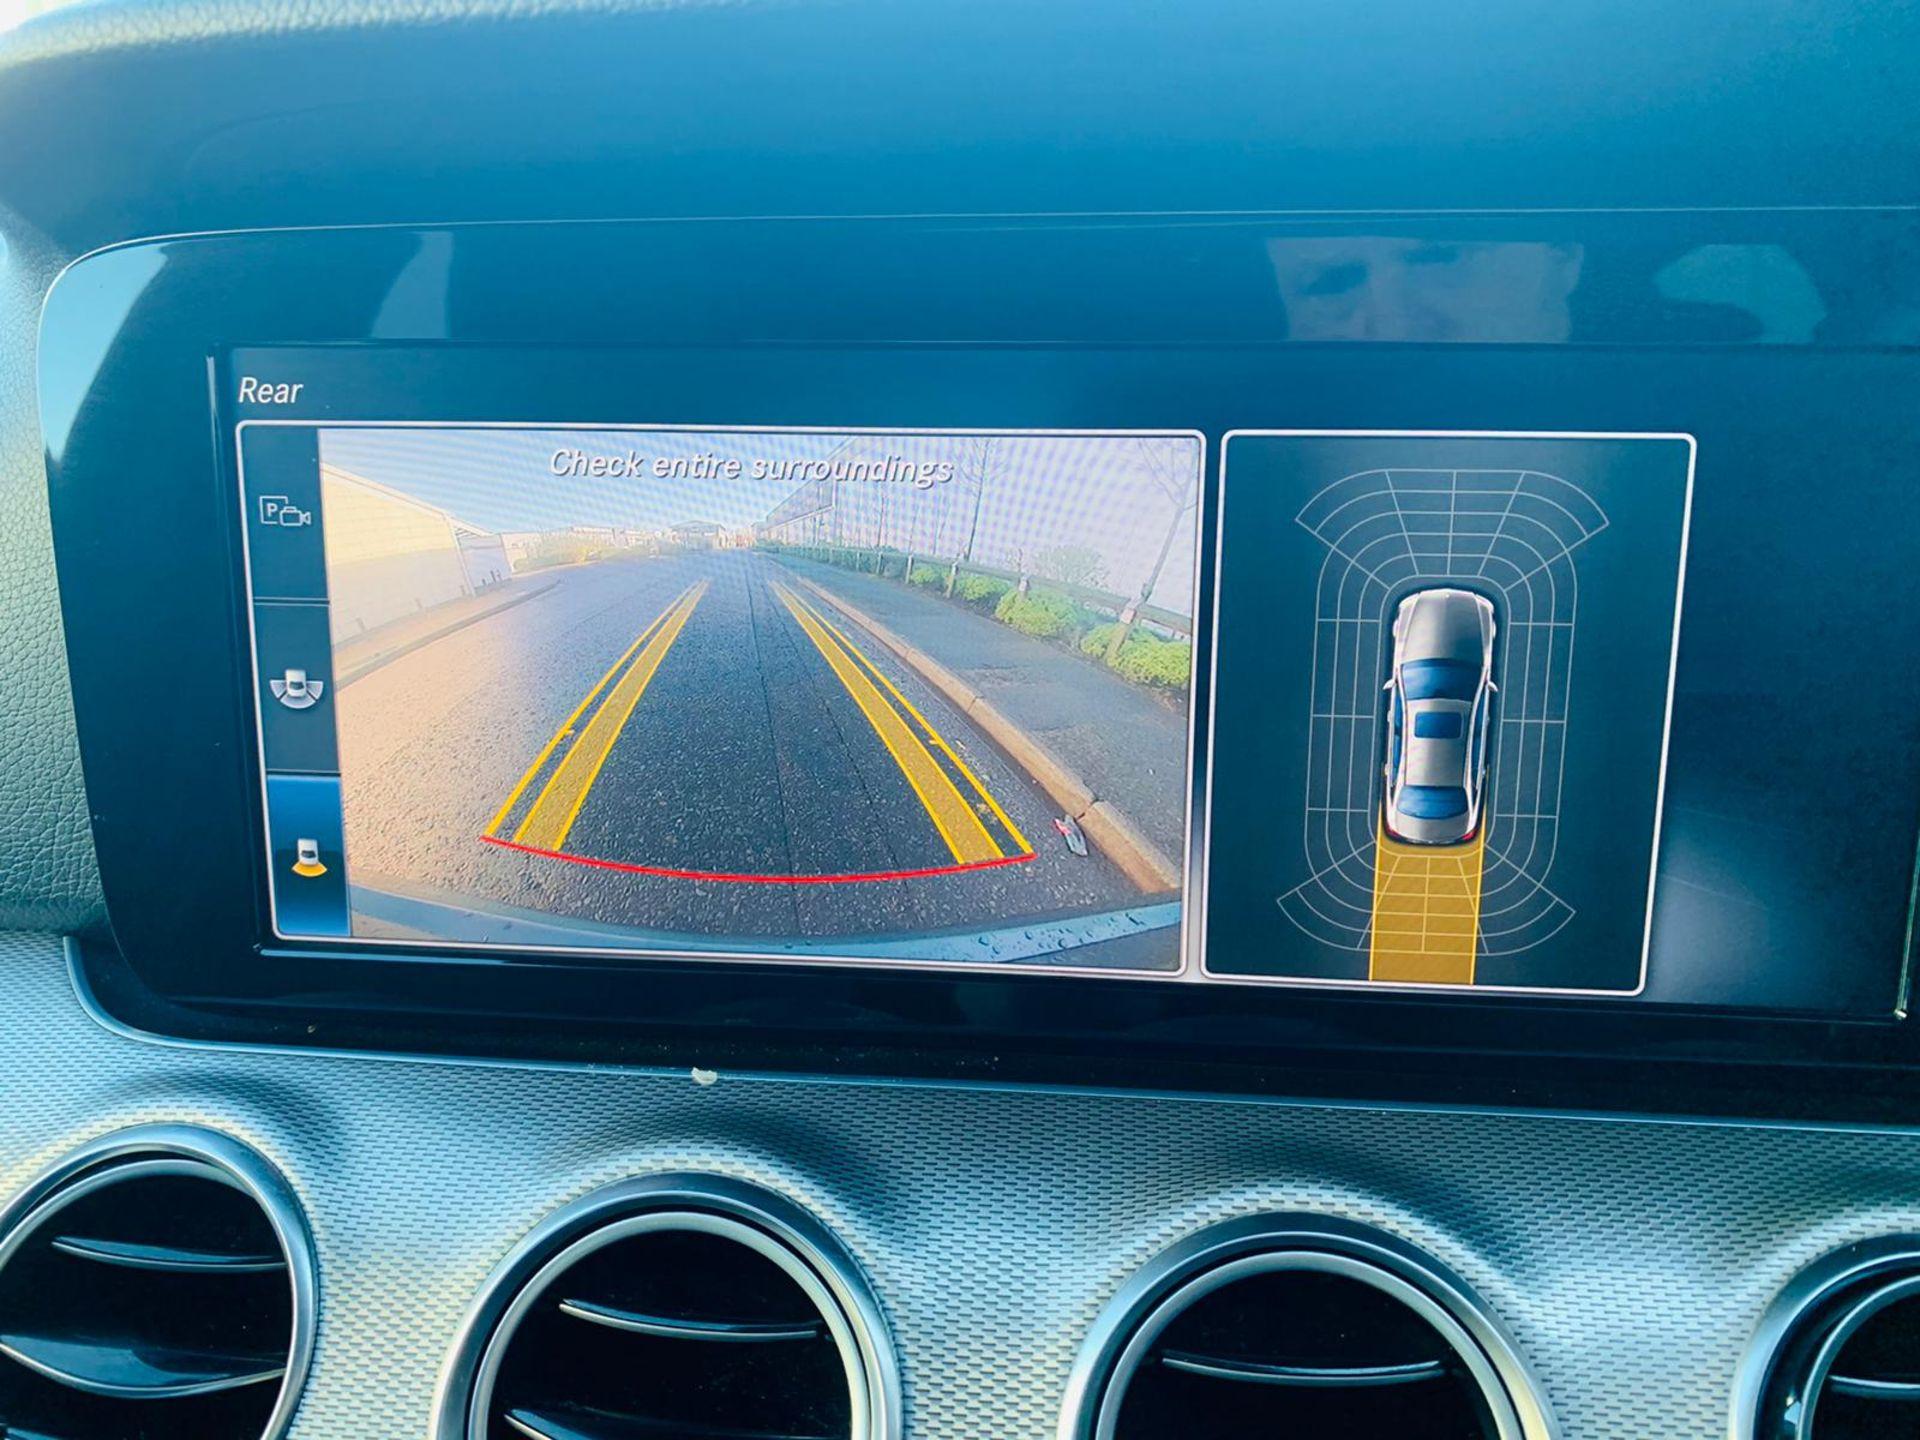 (RESERVE MET) Mercedes E220d Special Equipment Auto 2017 17 Reg - Sat Nav - Reversing Cam - Image 16 of 27